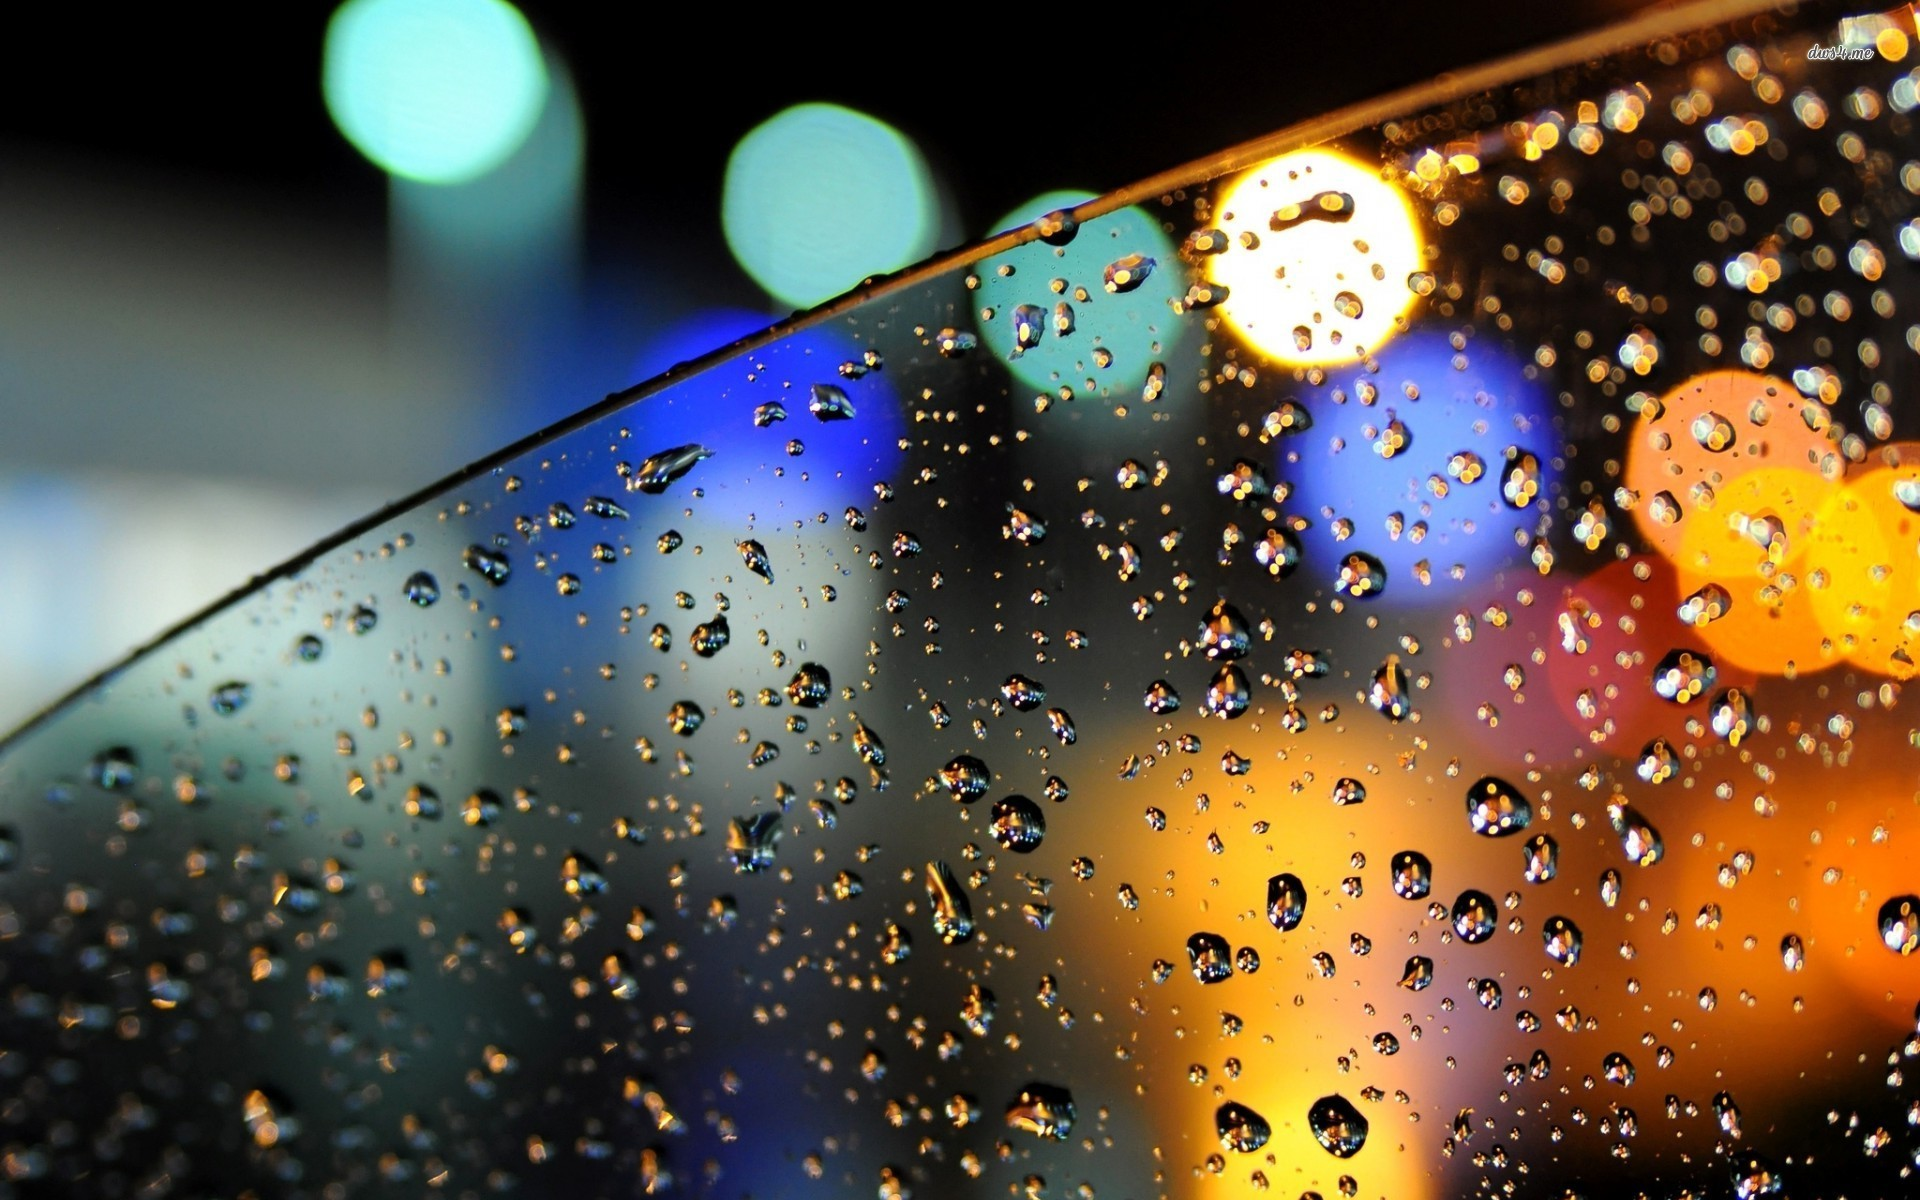 Rain Wallpapers With Quotes Hd Rain Window Wallpapers Hd Pixelstalk Net